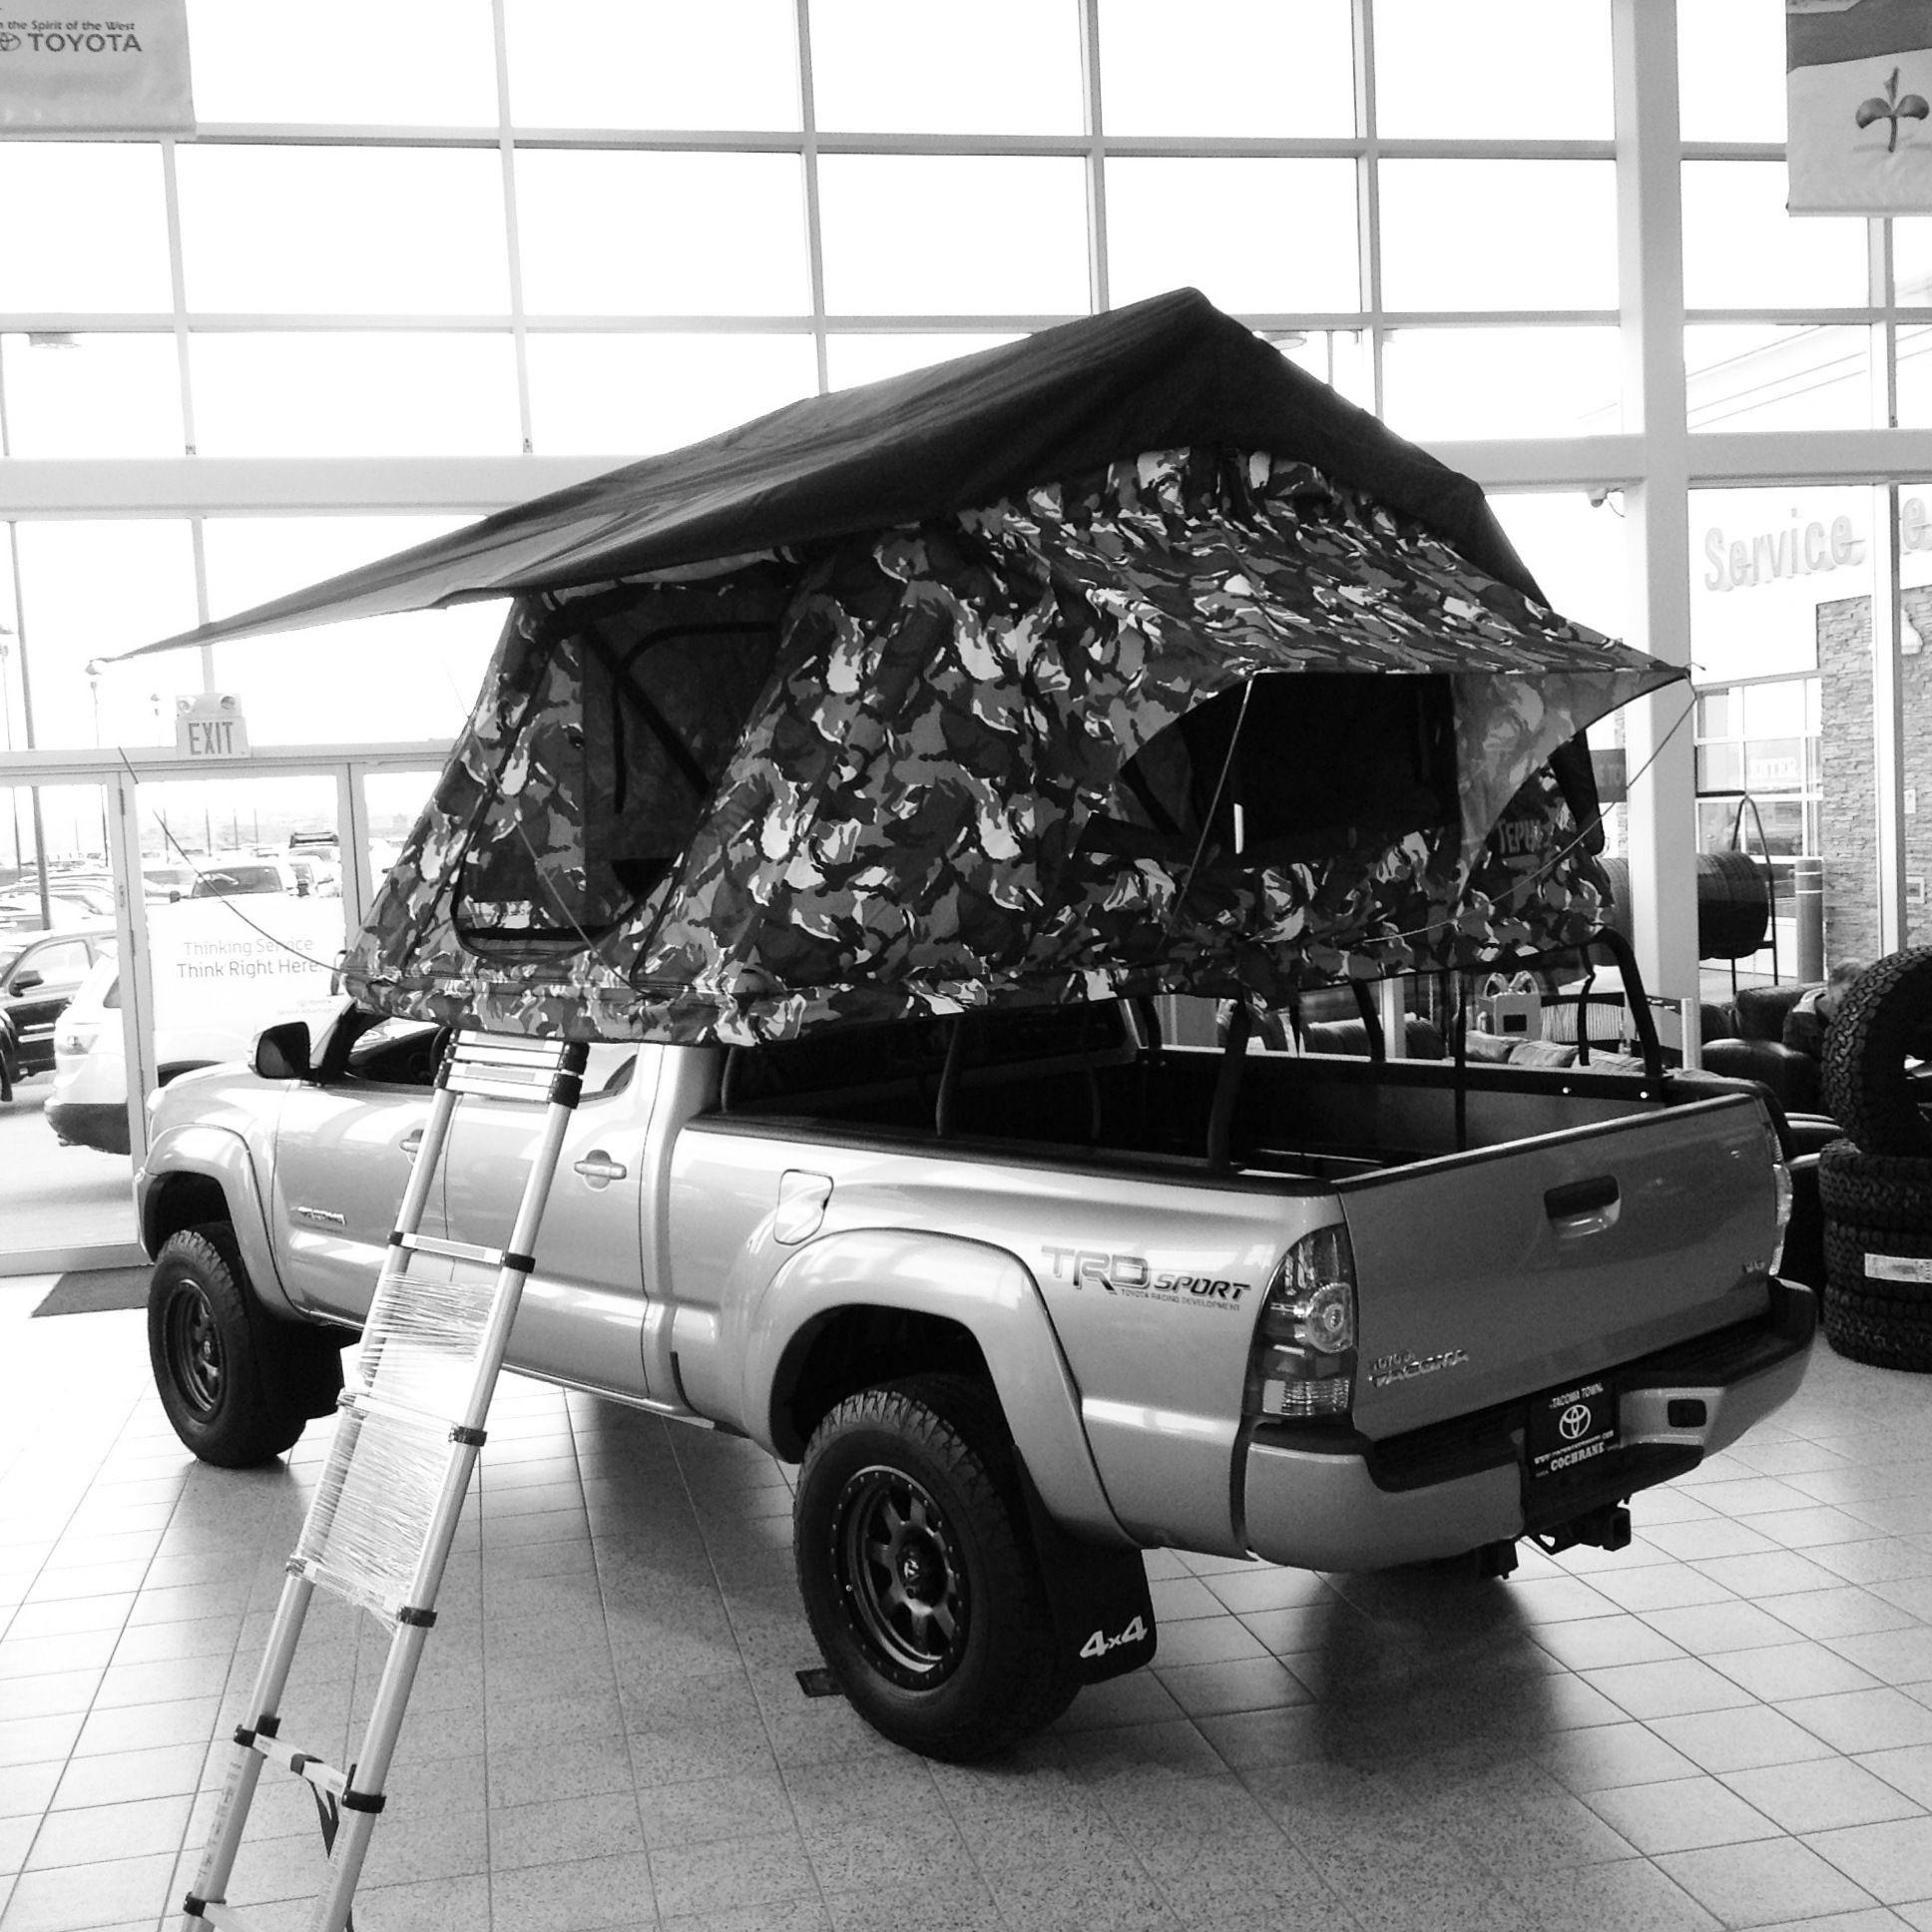 2015 Toyota Tacoma Doublecab V6 With Tepui Tent Stk 150005